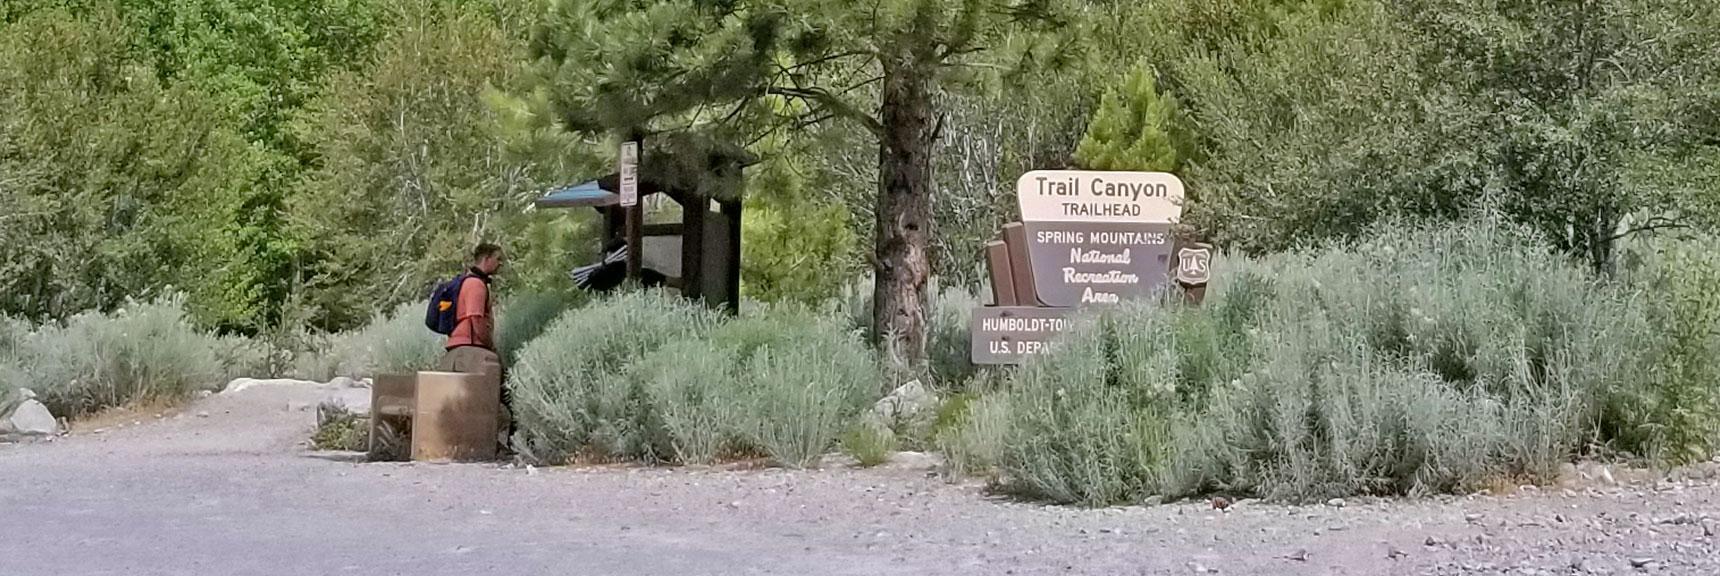 Trail Canyon Trailhead Parking Lot Starting Point for the Six Peak Circuit Adventure | Six Peak Circuit Adventure in the Spring Mountains, Nevada